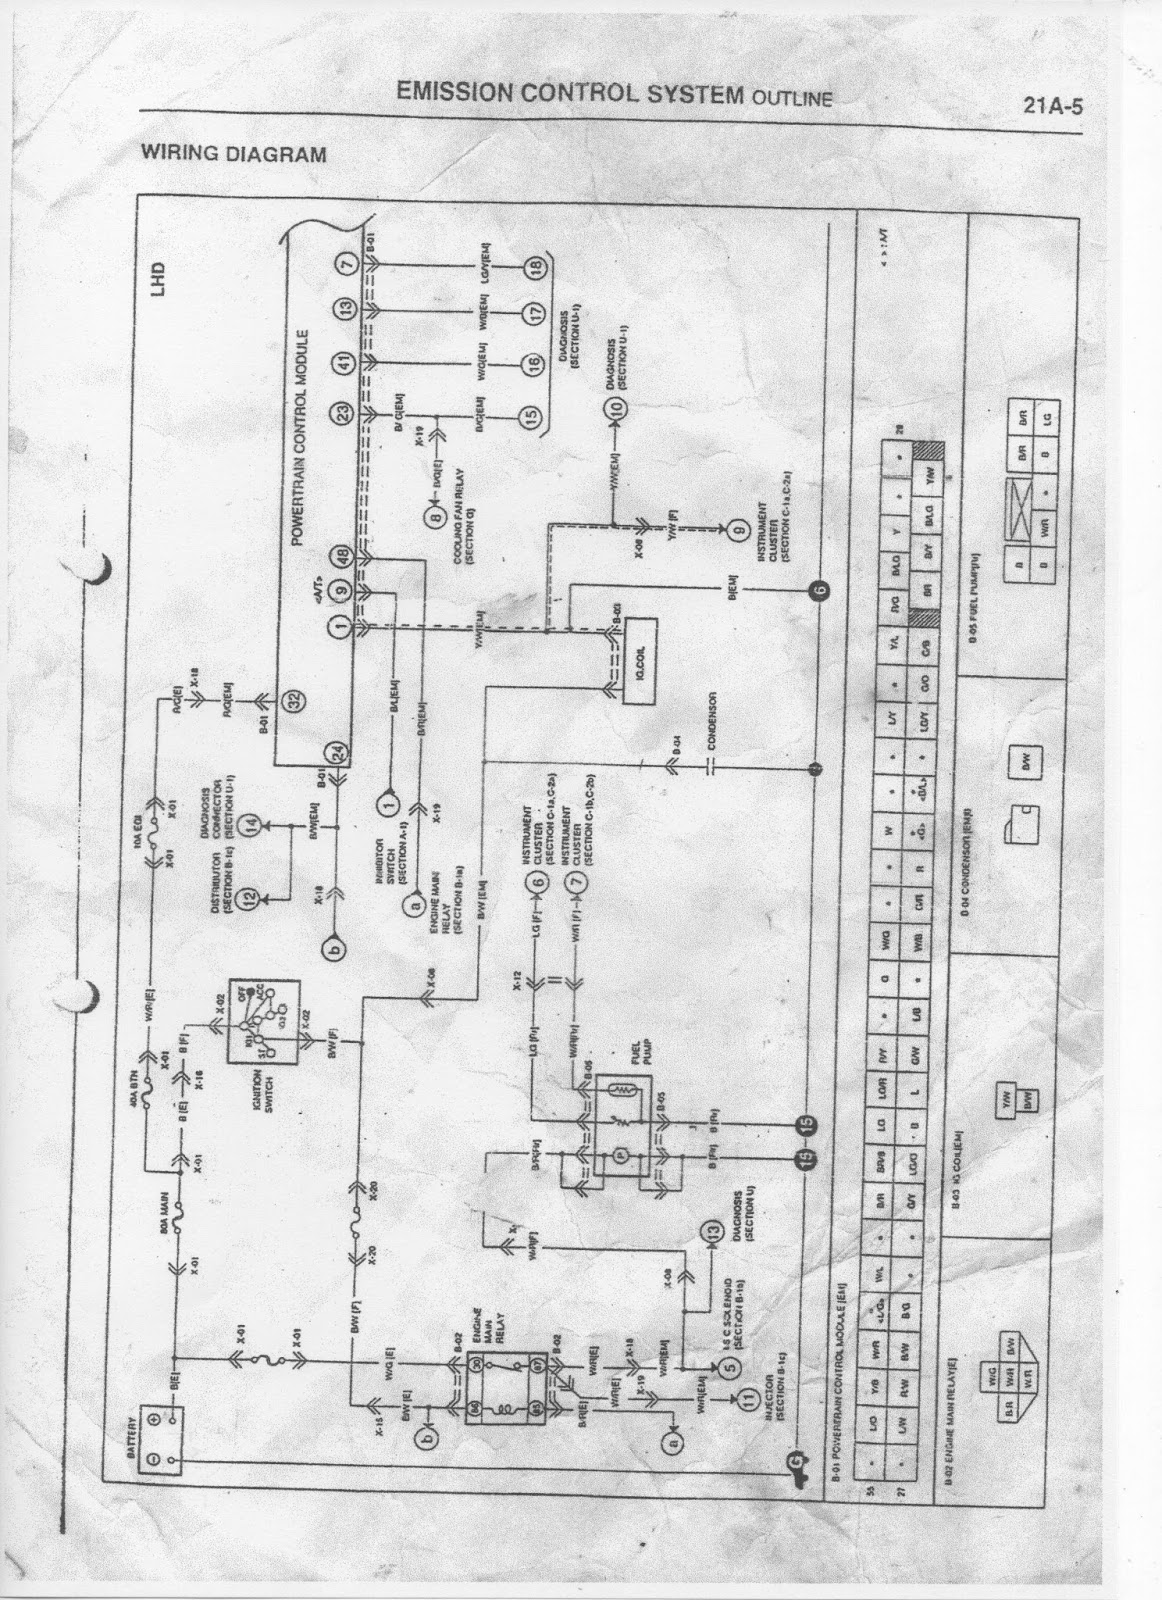 Mg Tf Electrical Wiring Diagram Porsche 944 Dme Daihatsu Hijet | Library